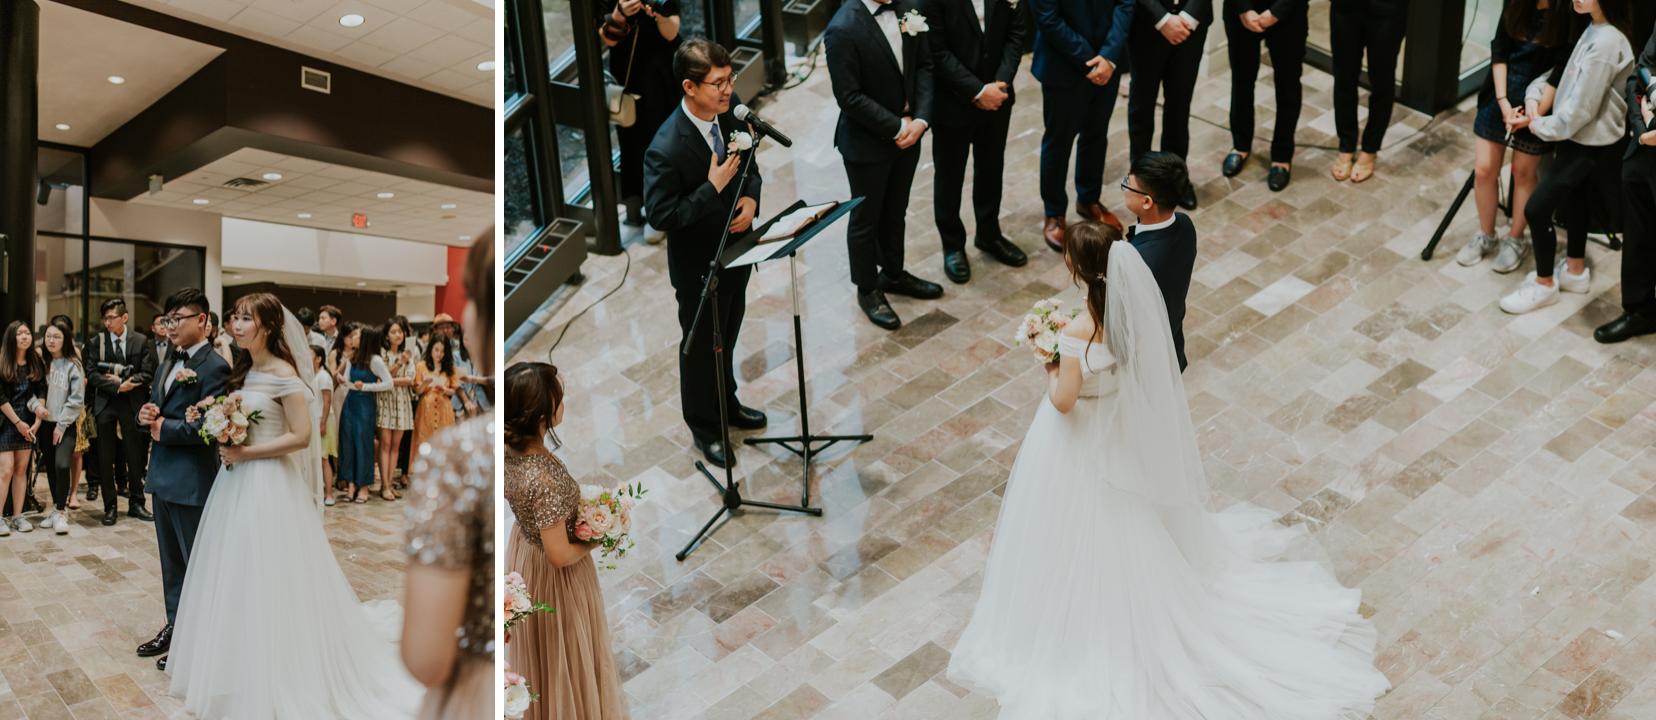 LGP-ann-arbor-eagle-crest-wedding-026.jpg